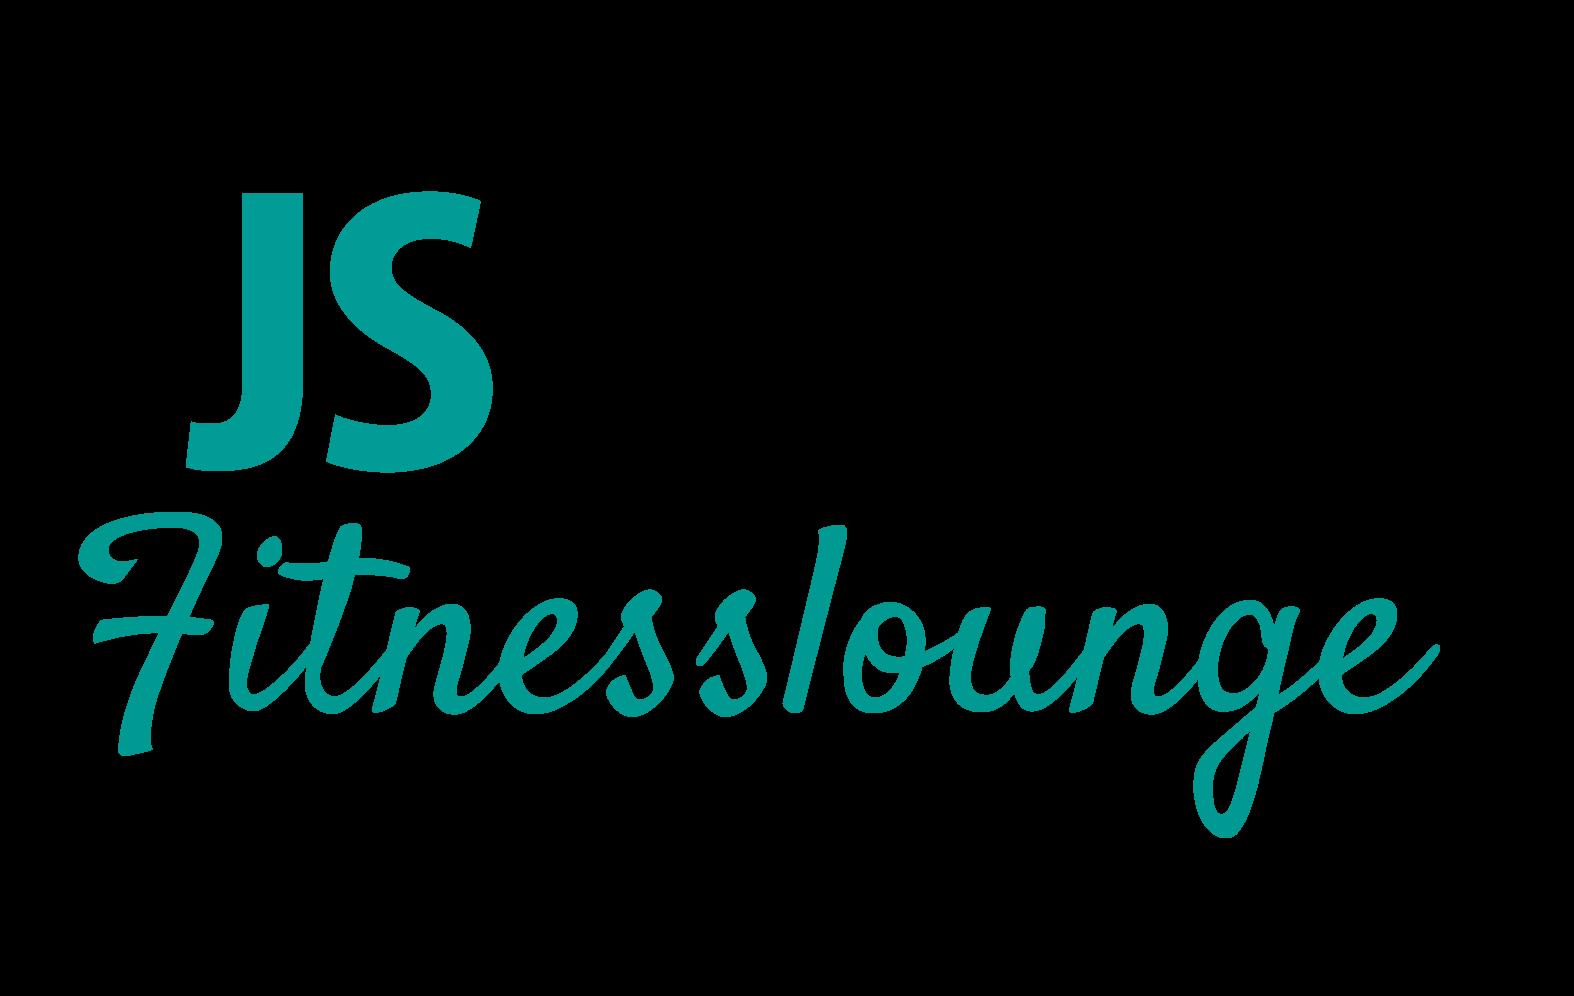 Logo Fitnesslounge